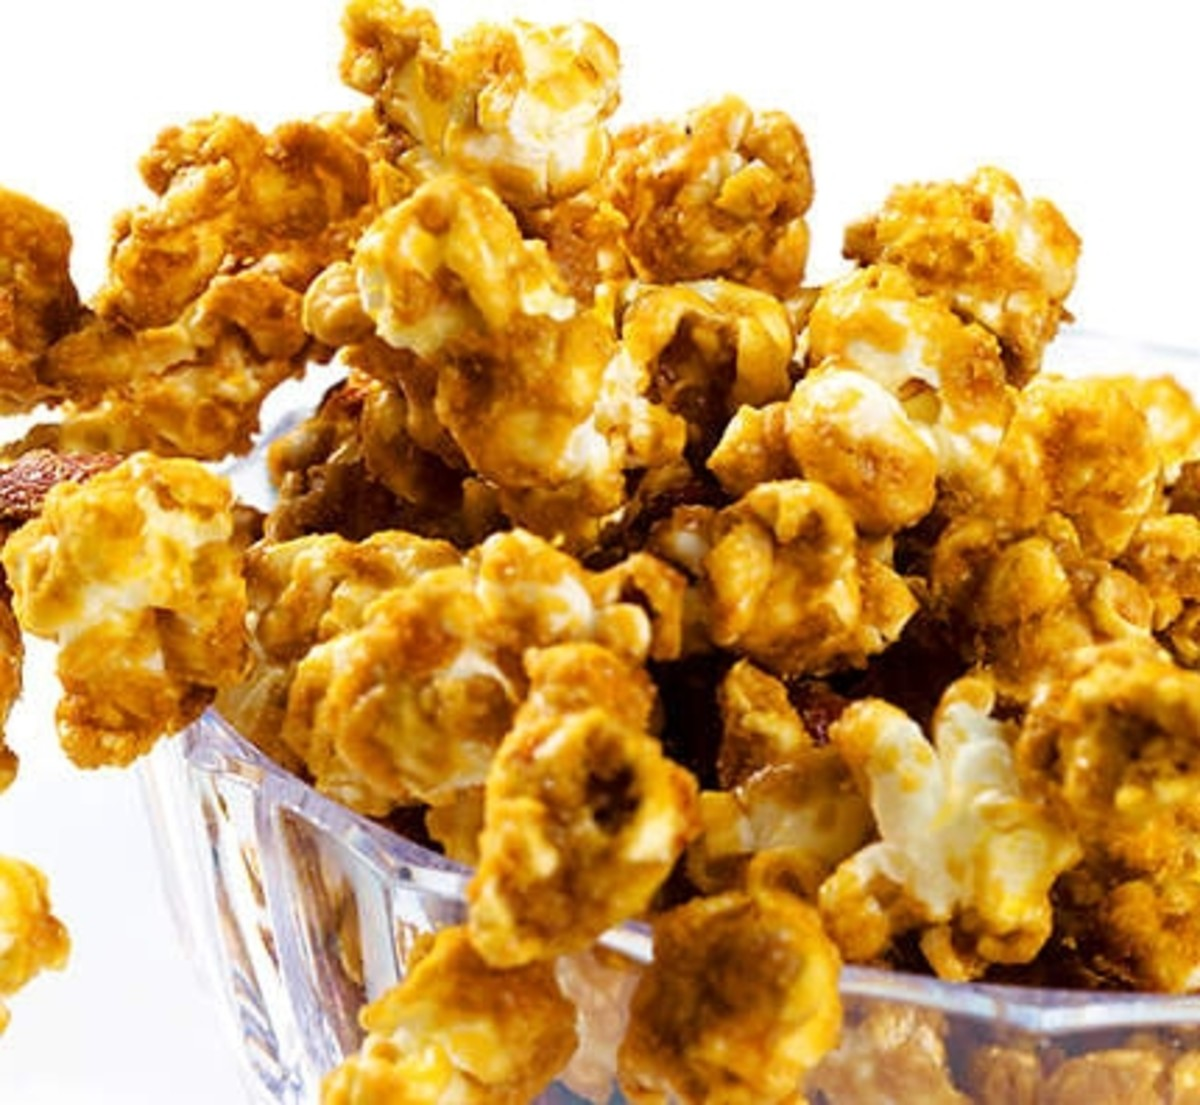 Sugar-free Caramel air popcorn